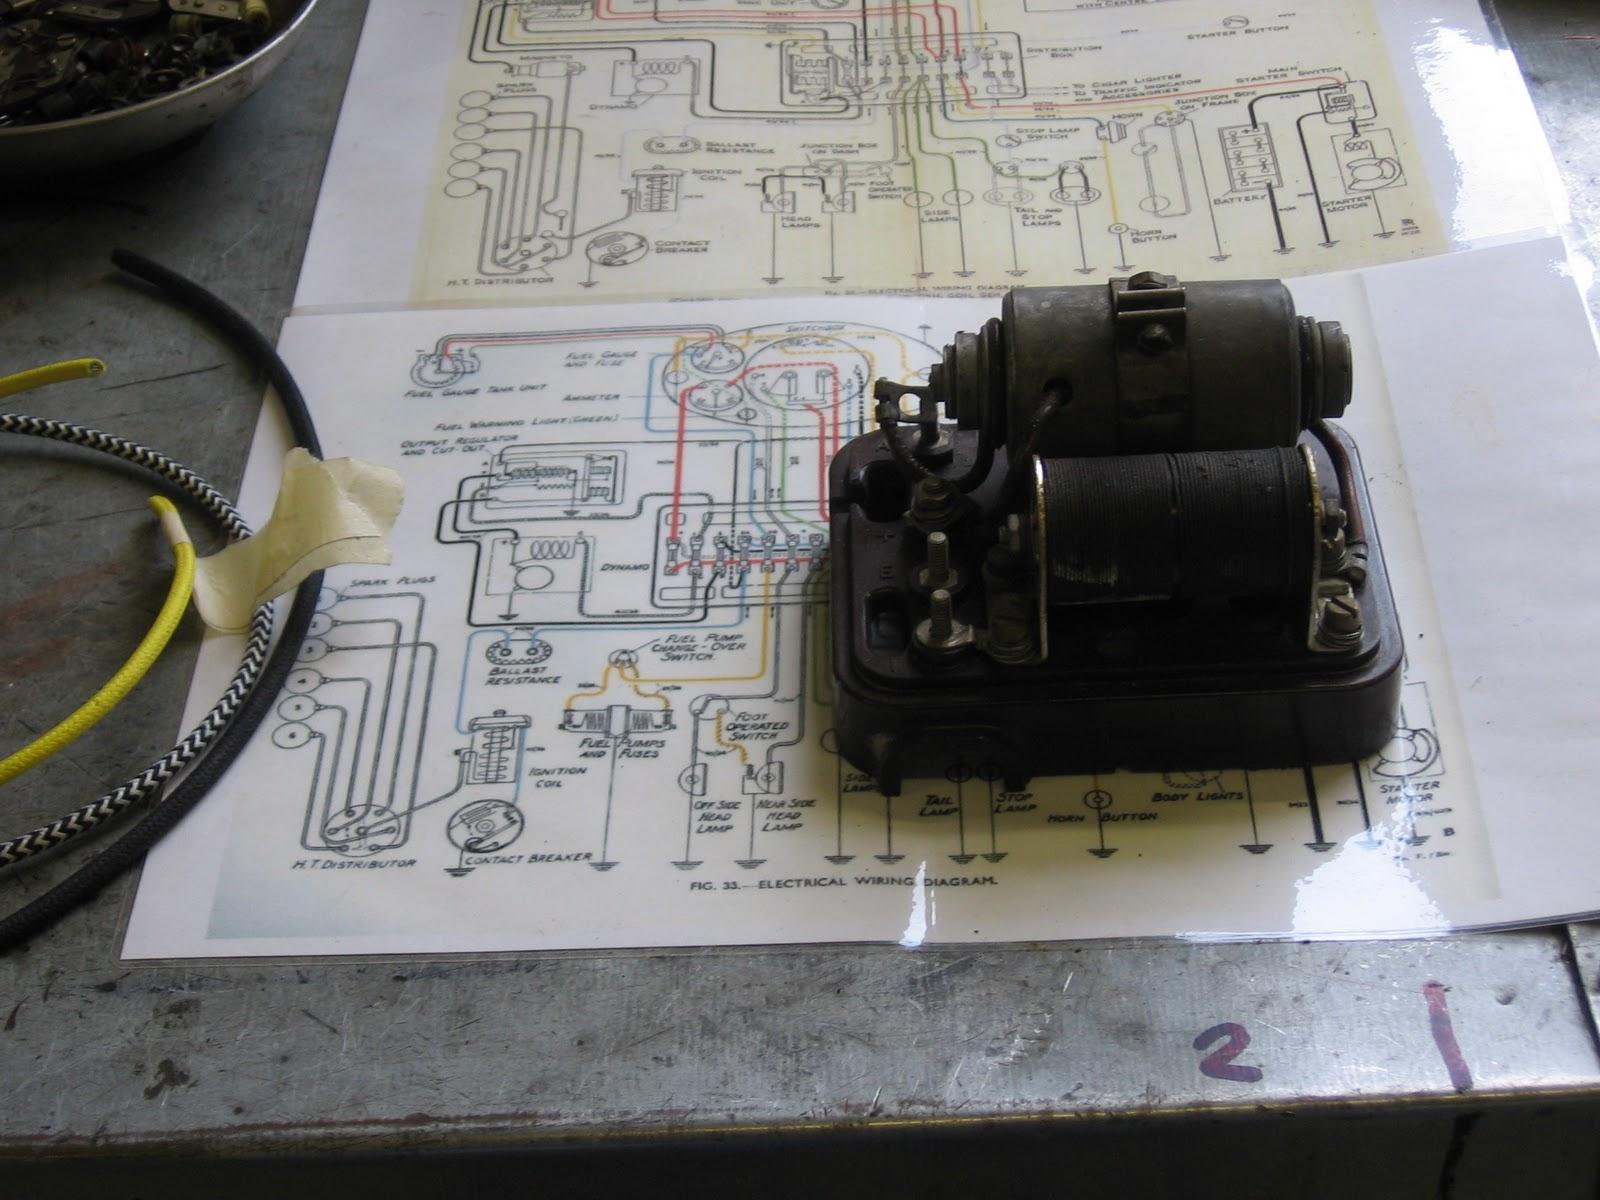 Bentley Wiring Diagram Schemes 2007 Milford Vintage Engineering Ltd Derby 4 1 Re Wire Rh Blogspot Com Continental Pdf Turbo R